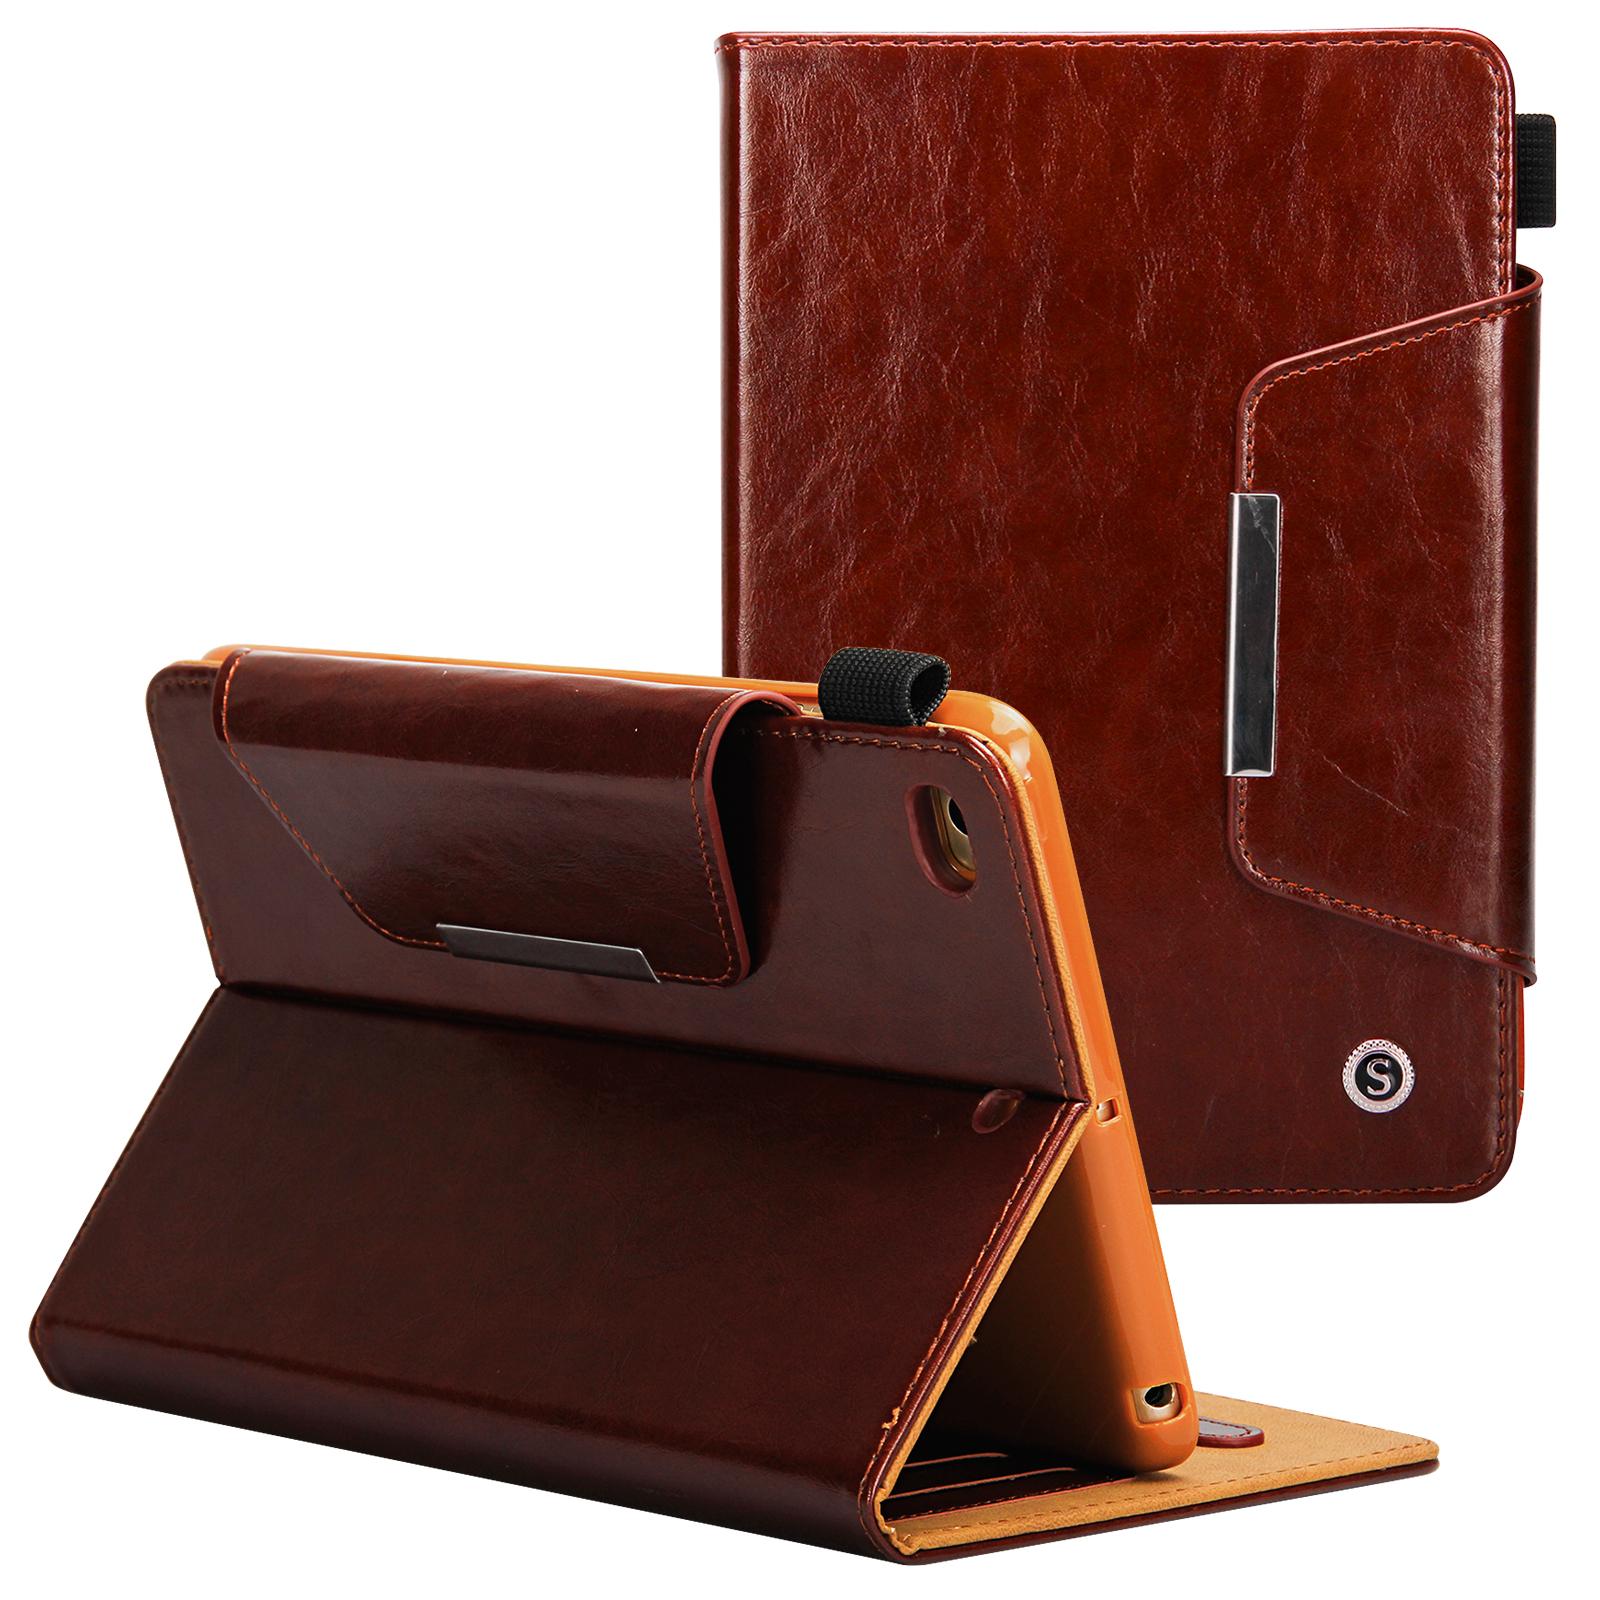 iPad Mini 1/2/3/4 Case - Goodest Slim Fit PU Leather Folio Smart Folio Stand Case with Auto Wake/Sleep Magnetic Cover for Apple iPad Mini 4/ Mini 3/ Mini 2/ Mini 1, Brown